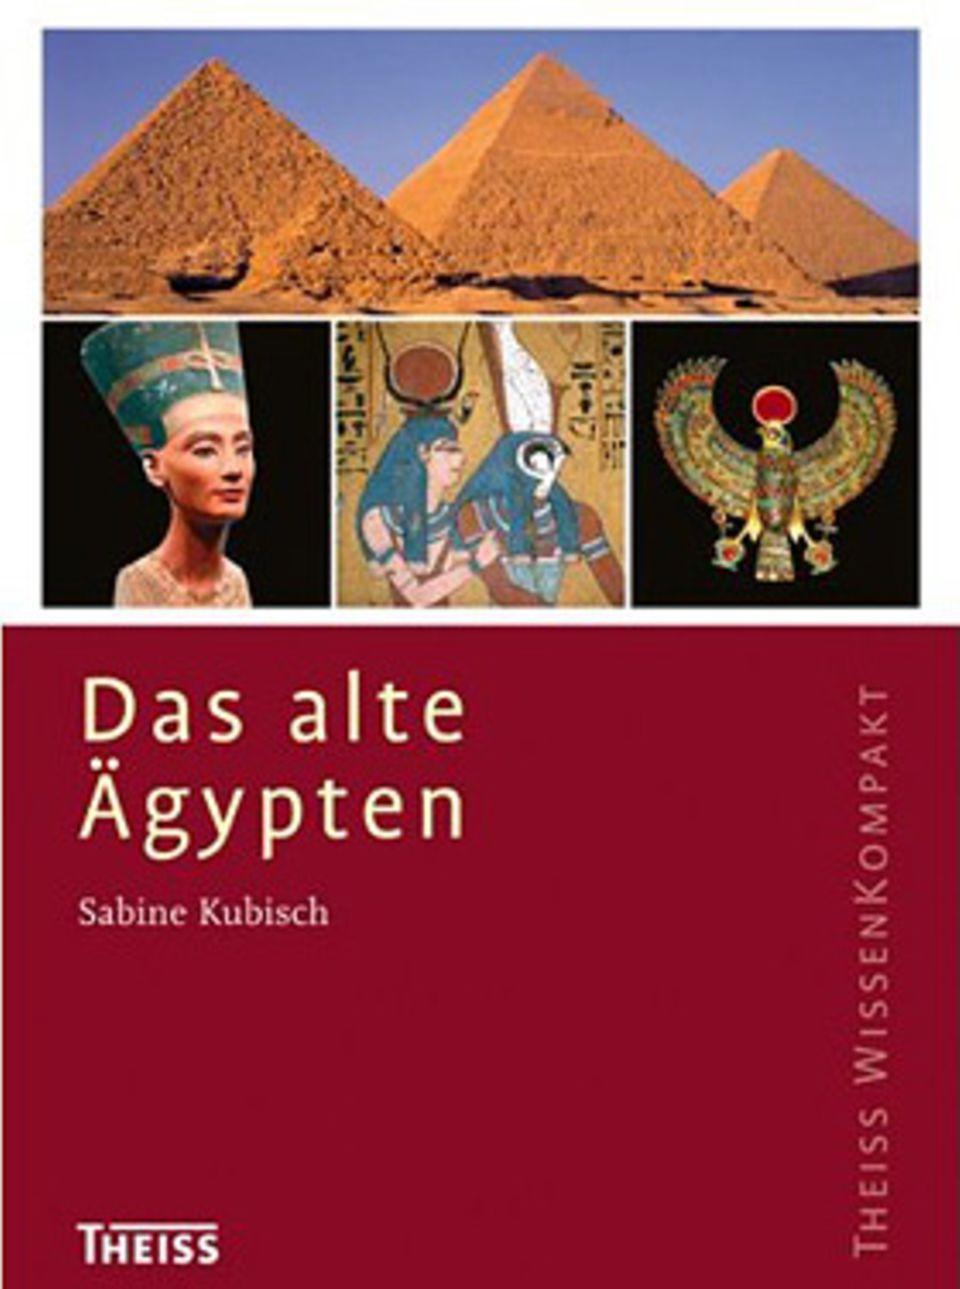 Ägypten: Das alte Ägypten: Buchtipps